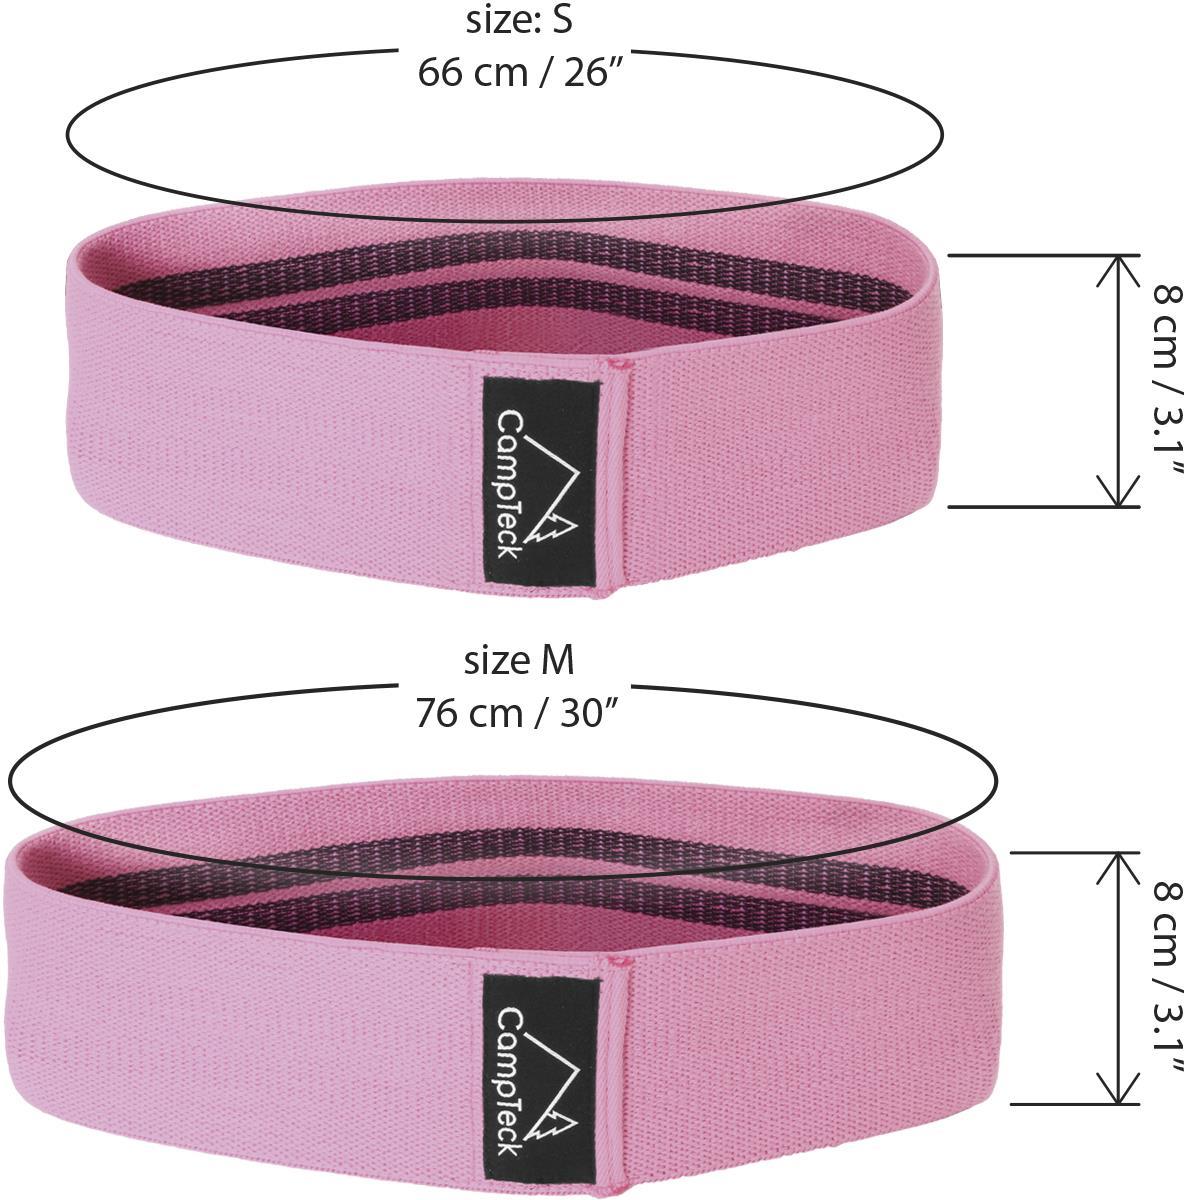 Hip-Band-Circle-Loop-Rotation-Glute-Resistance-Thrust-Leg-Squat-Gym-Exercise miniatuur 19